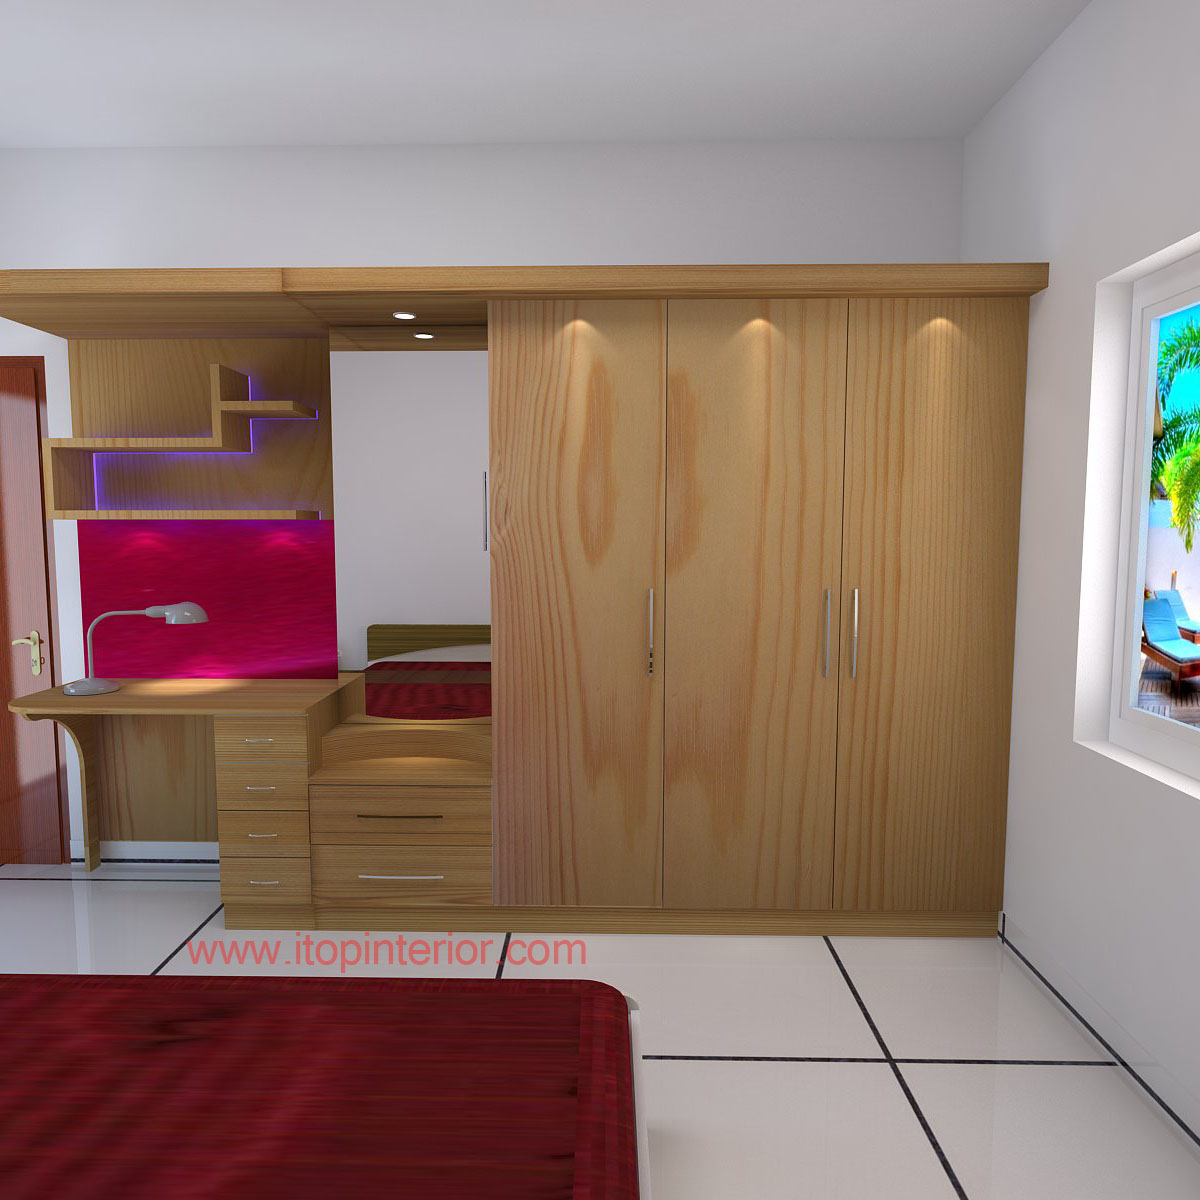 Futured image for wardrobe